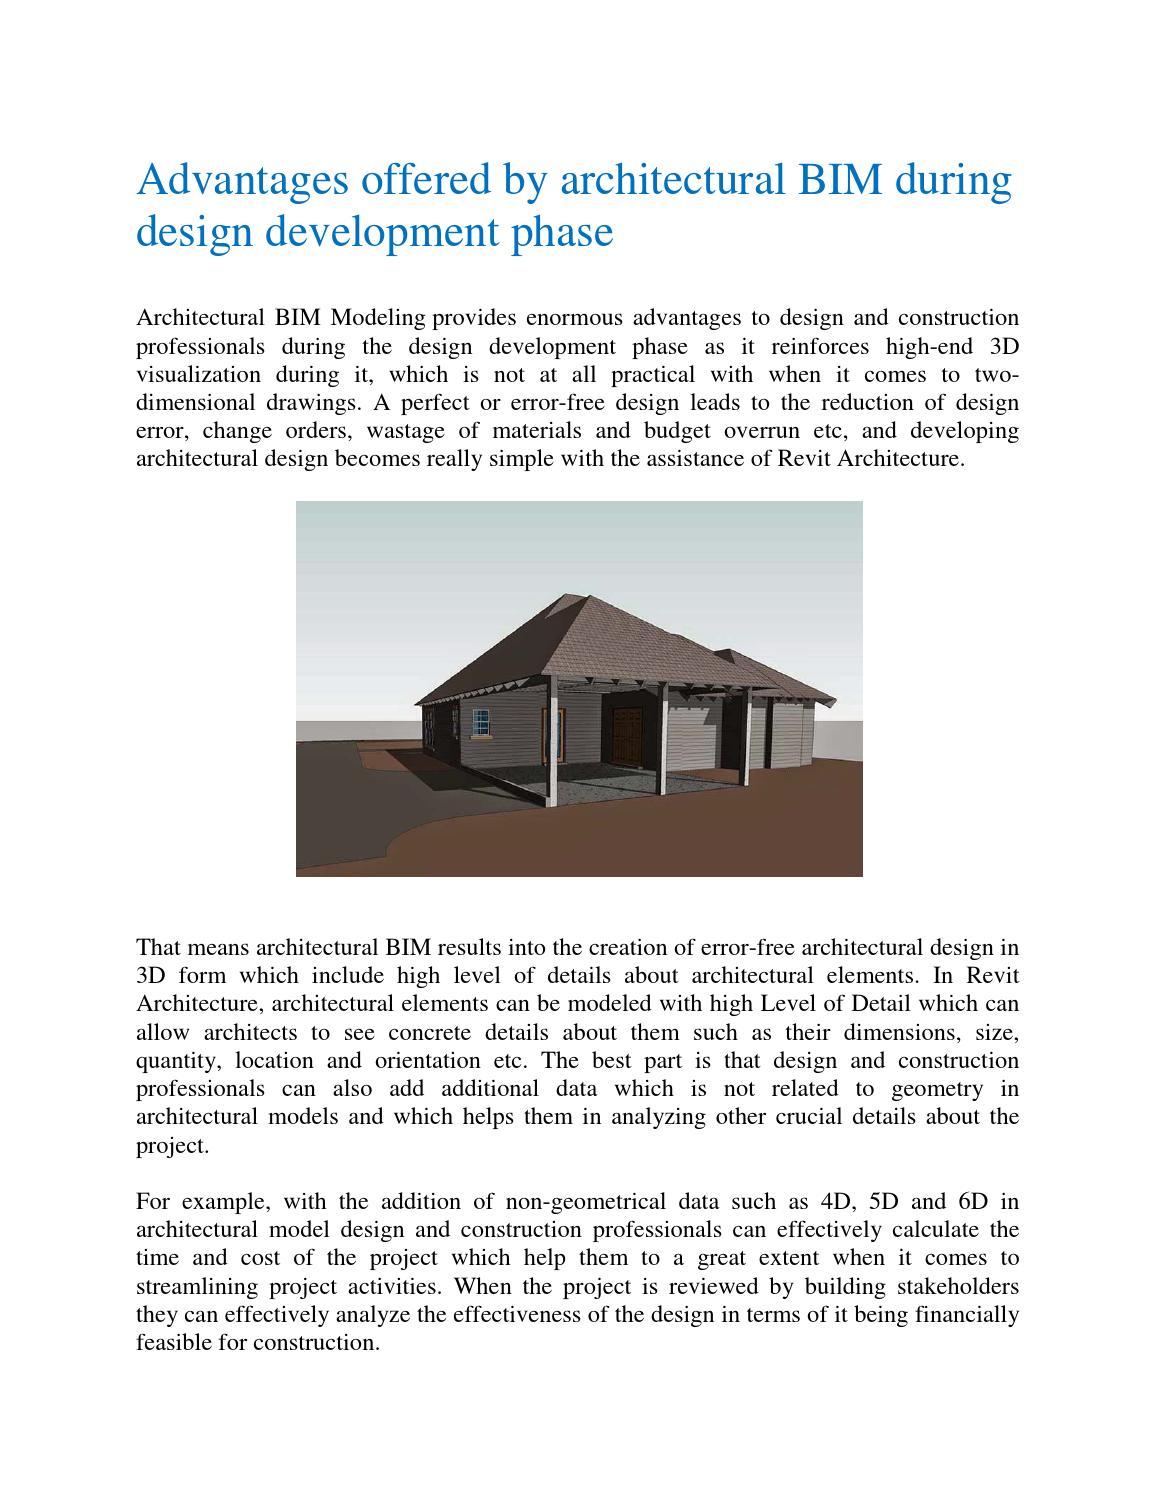 Advantages offered by architectural BIM during design development